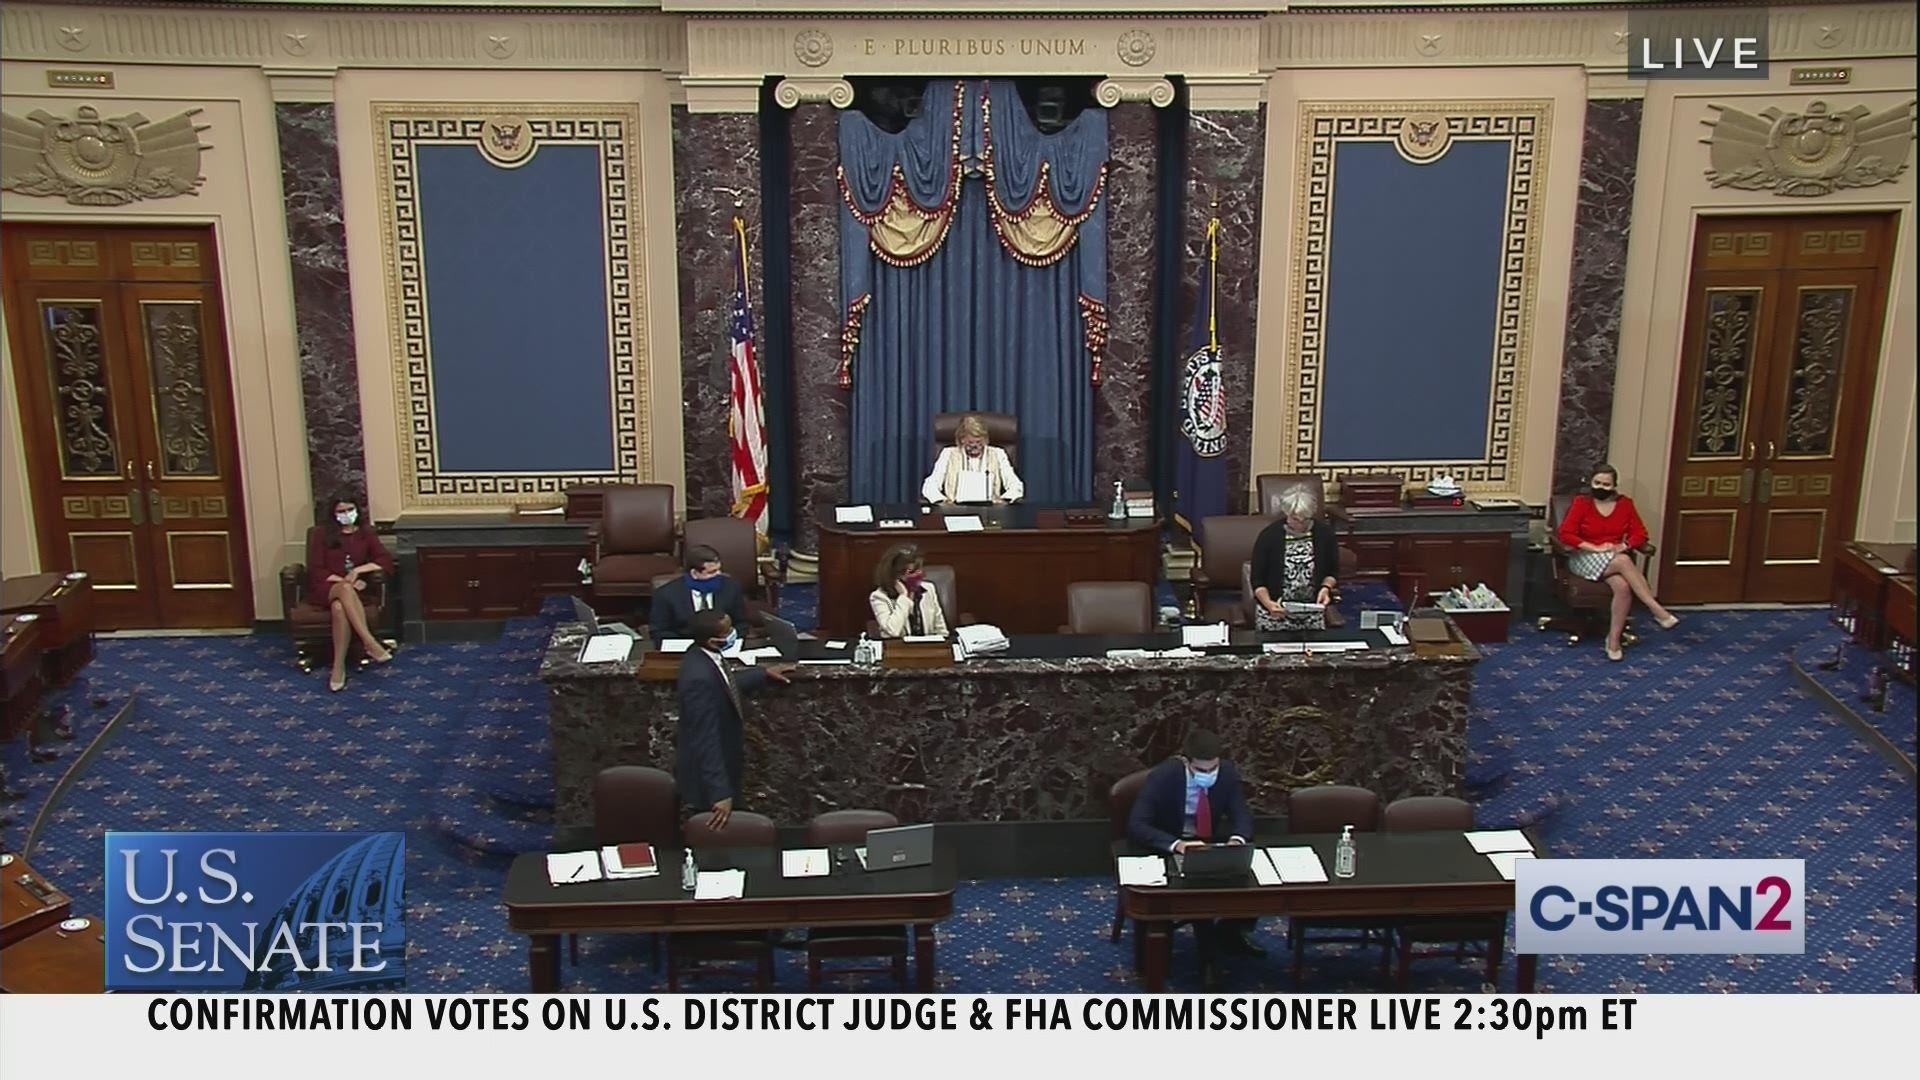 Senate Session Part 2 C Span Org